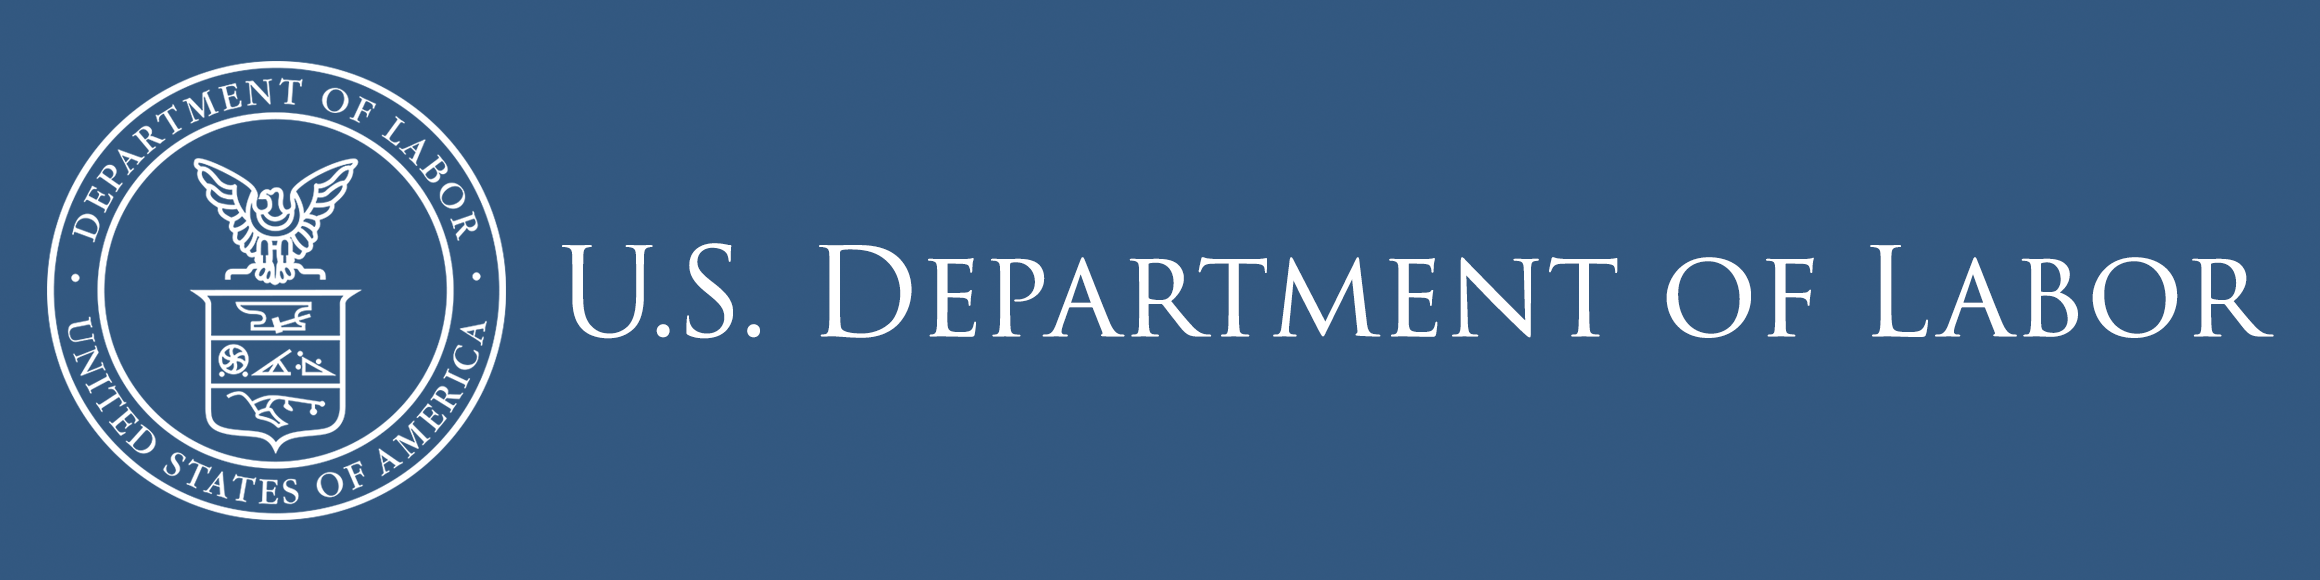 Department of labor Logos